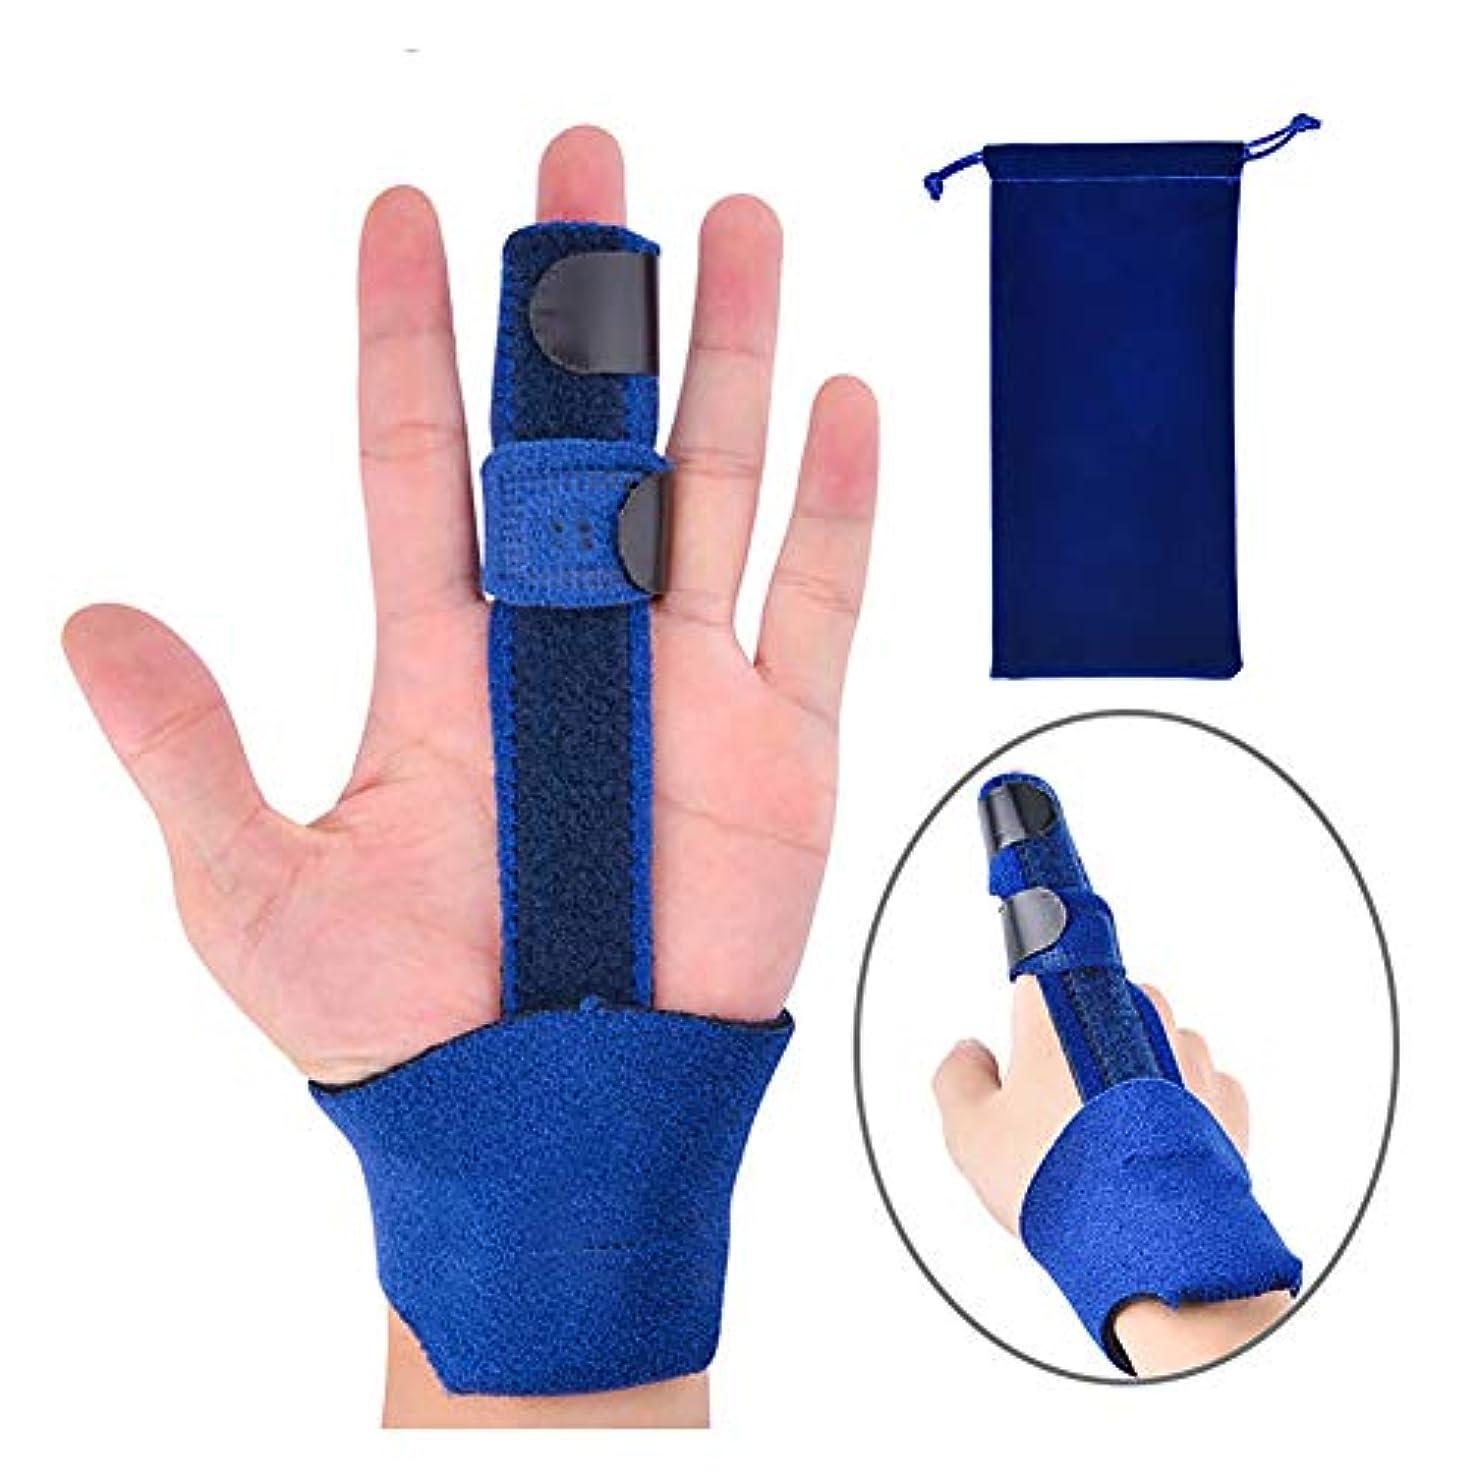 Trigger Finger Splint - 曲がった槌または関節炎の指の接合箇所、傷害、関節炎のためのまっすぐな医学等級の調節可能なアルミニウム指、トリガーの指